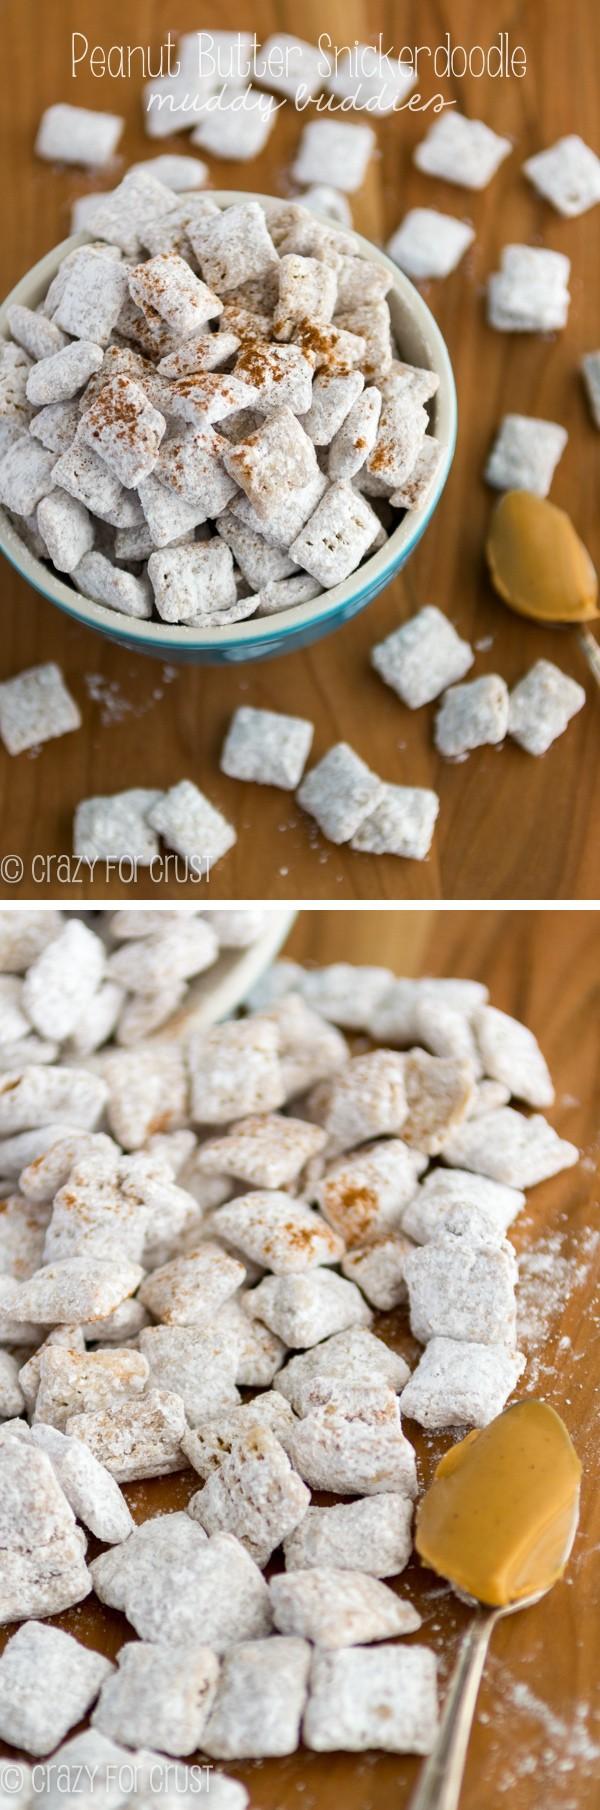 Peanut Butter Snickerdoodle Muddy Buddies collage